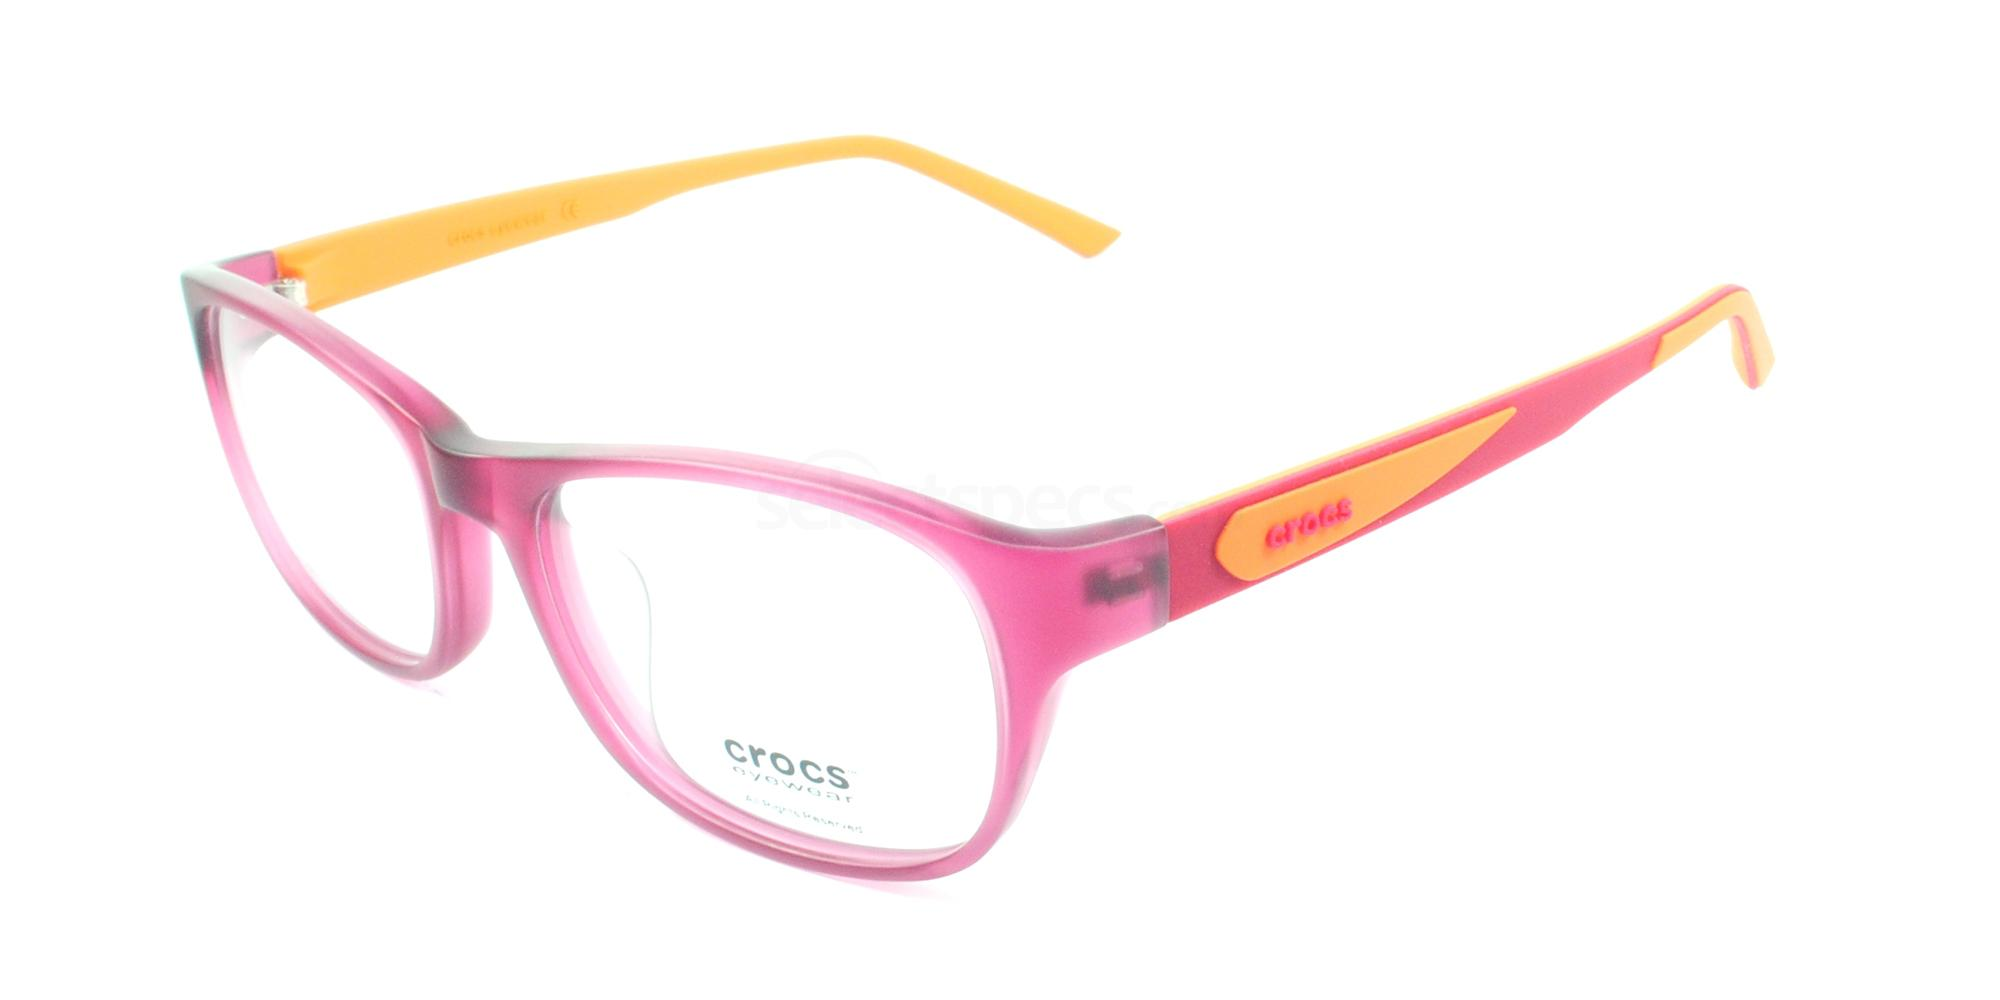 15OE CF 332 Glasses, Crocs Eyewear